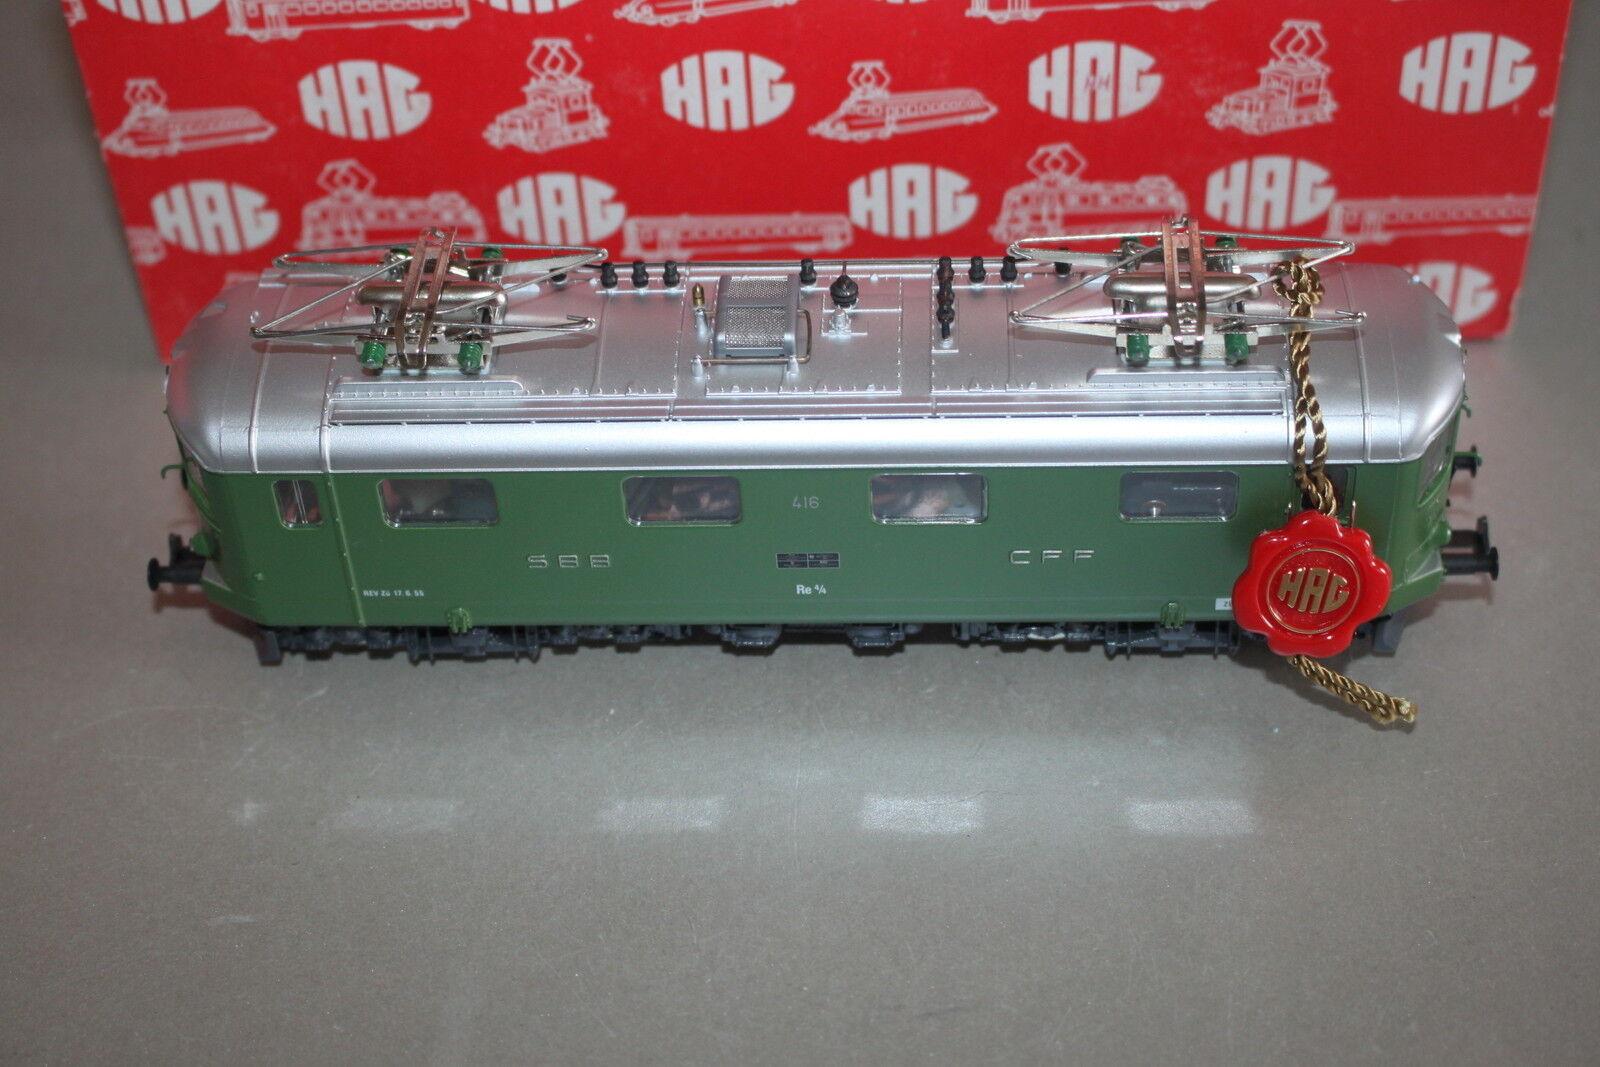 HAG 235 elok re 4 4 serie i Linden verde corrente alternata traccia h0 OVP